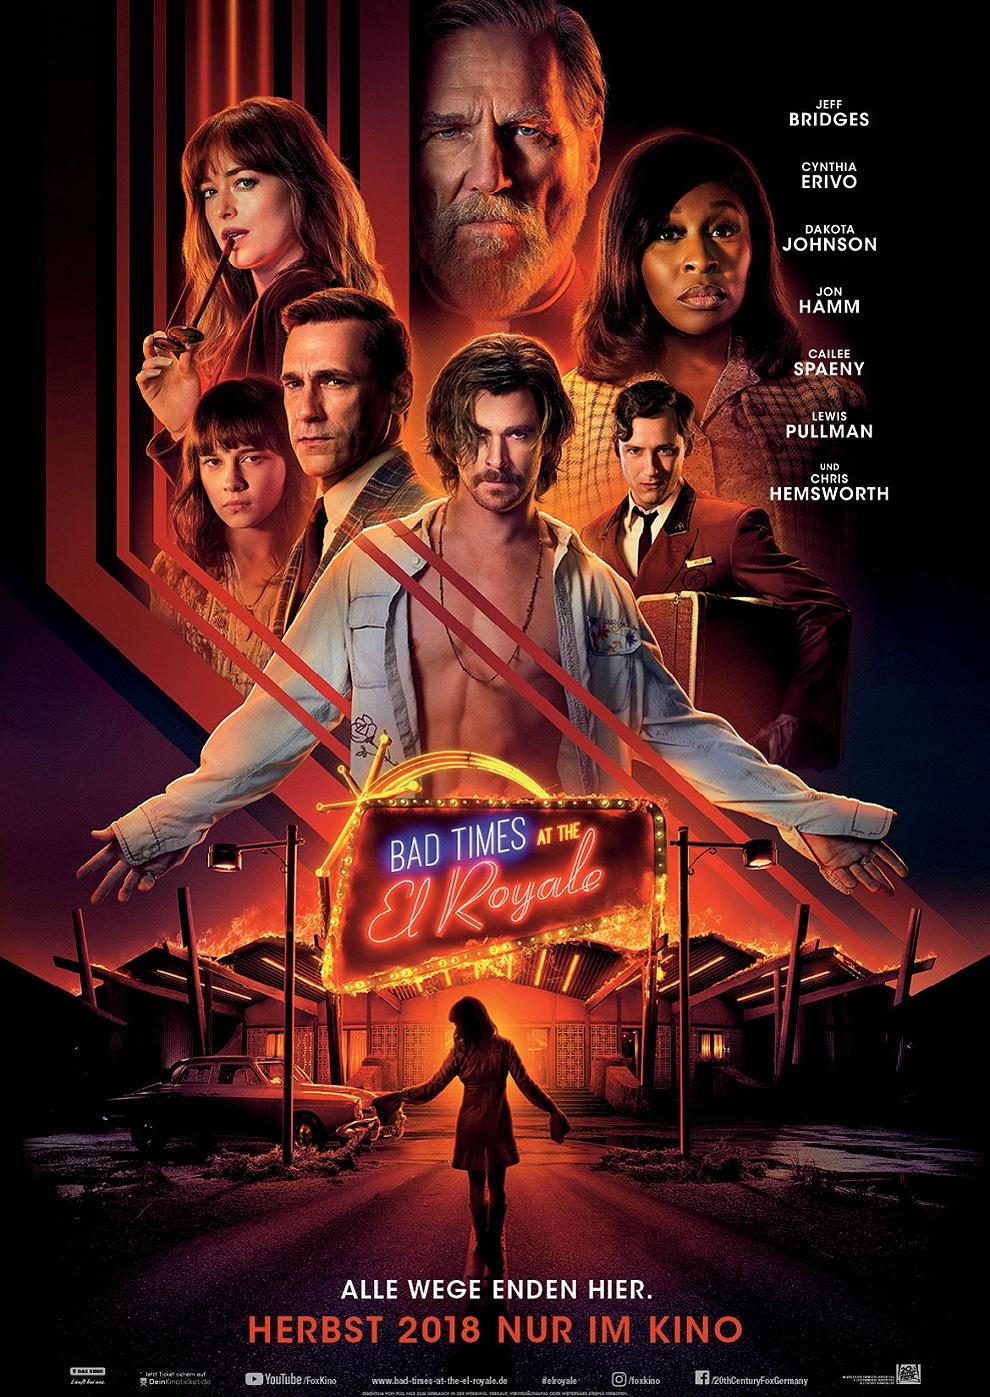 Bad Times at the El Royale (Poster)